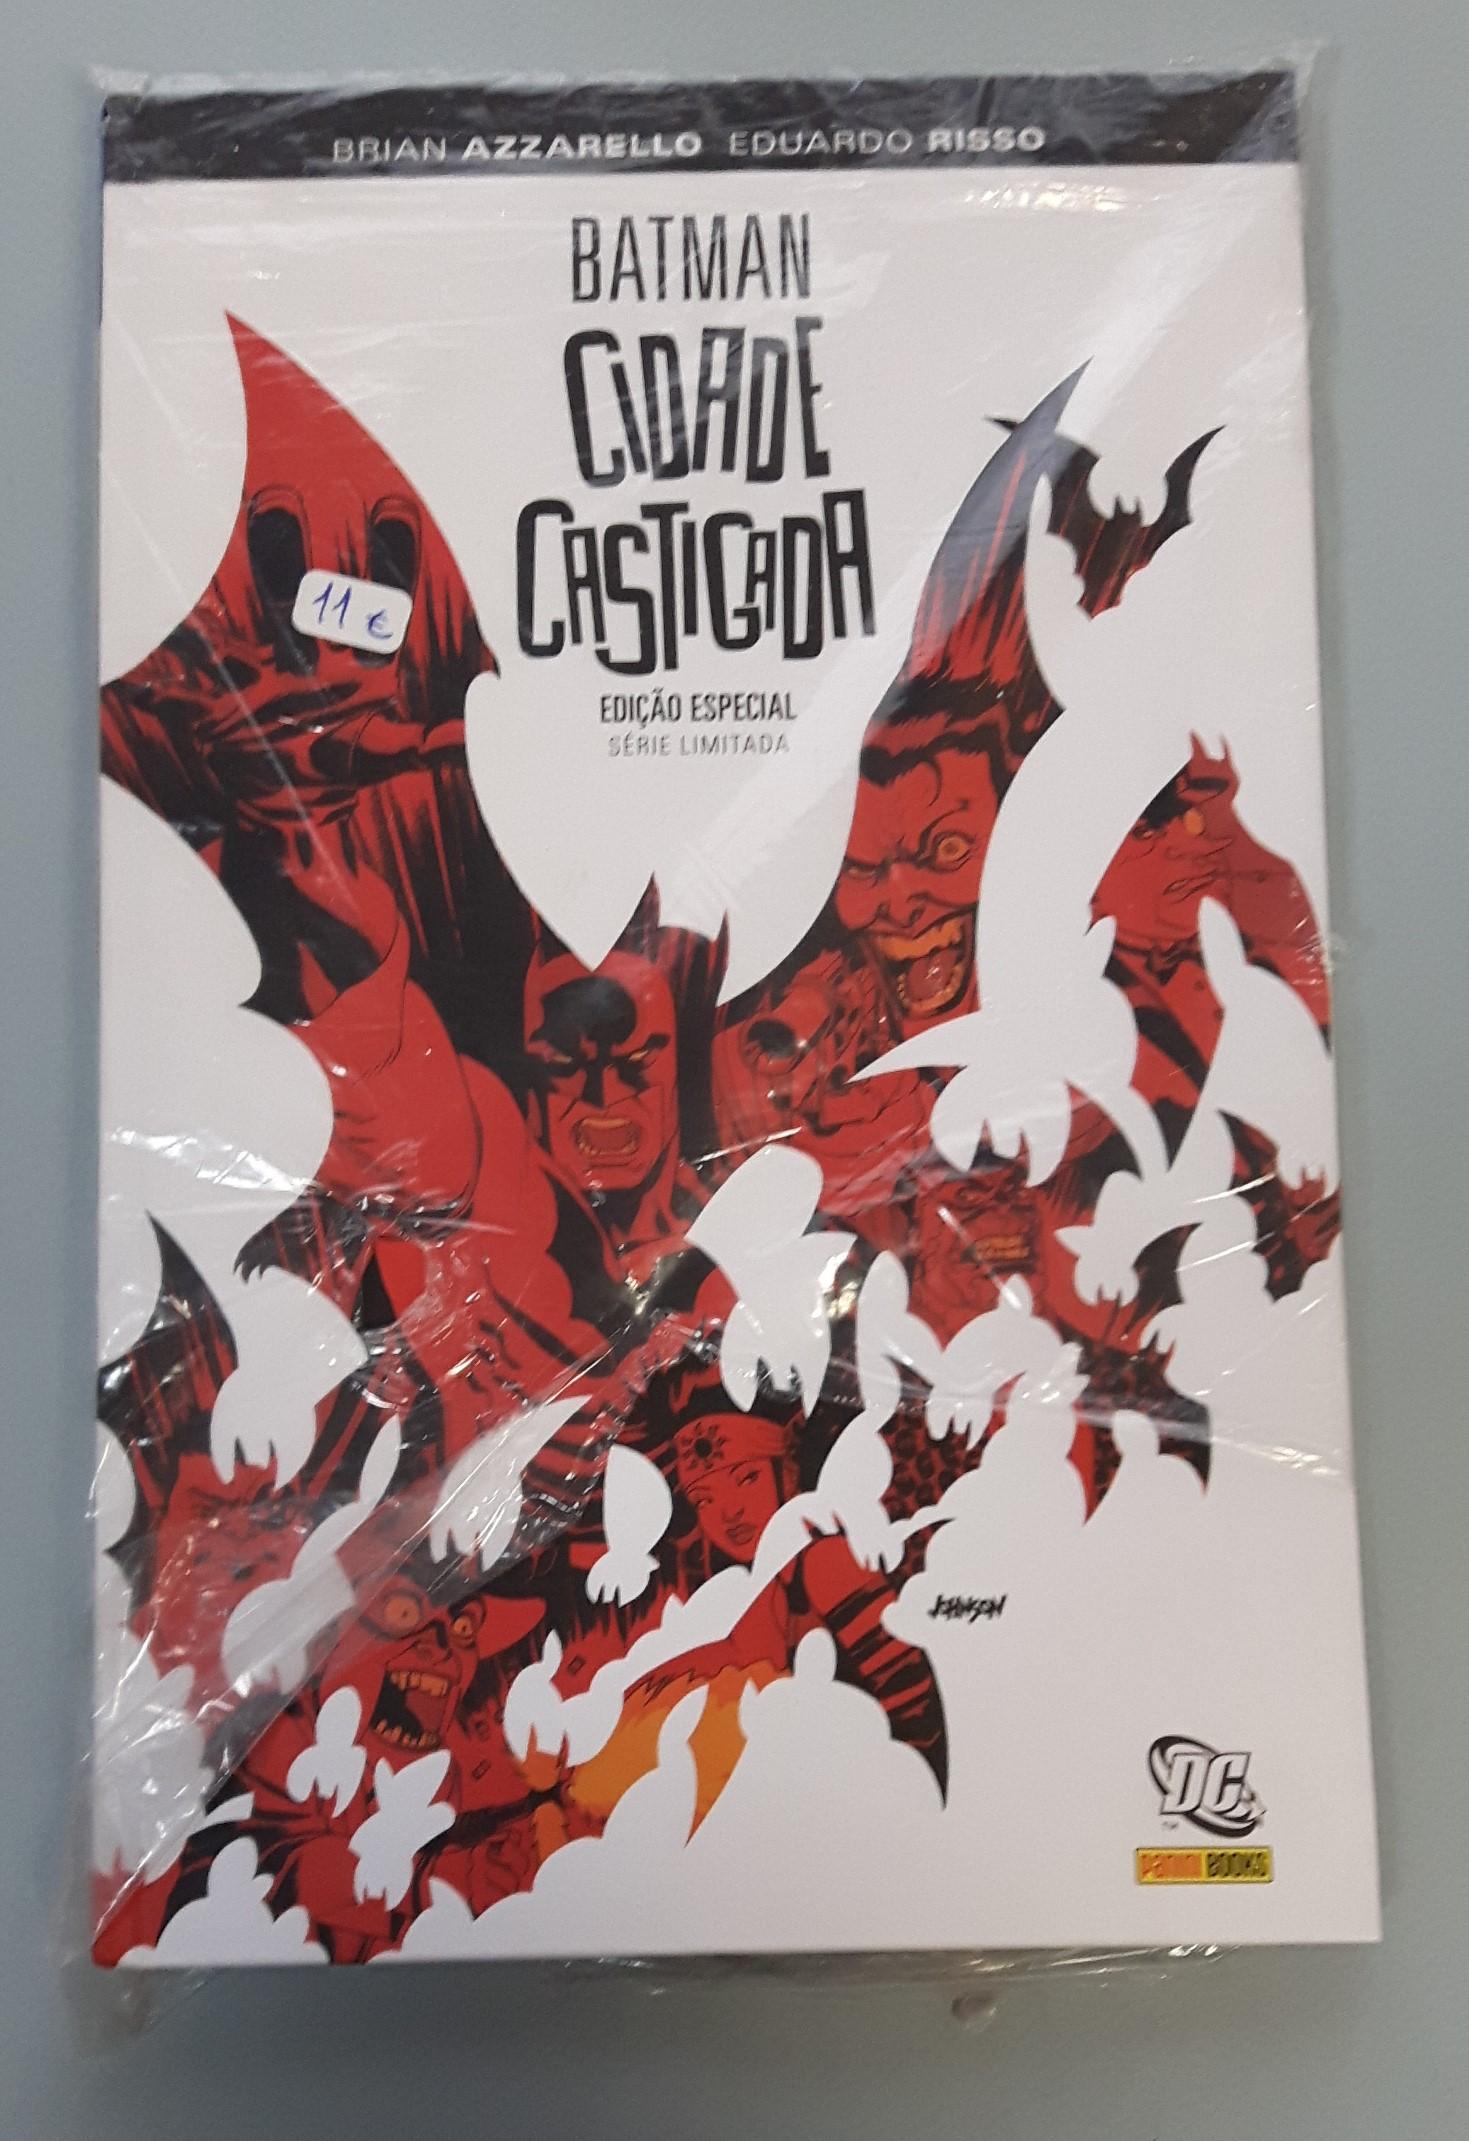 BATMAN: CIDADE CASTIGADA HC